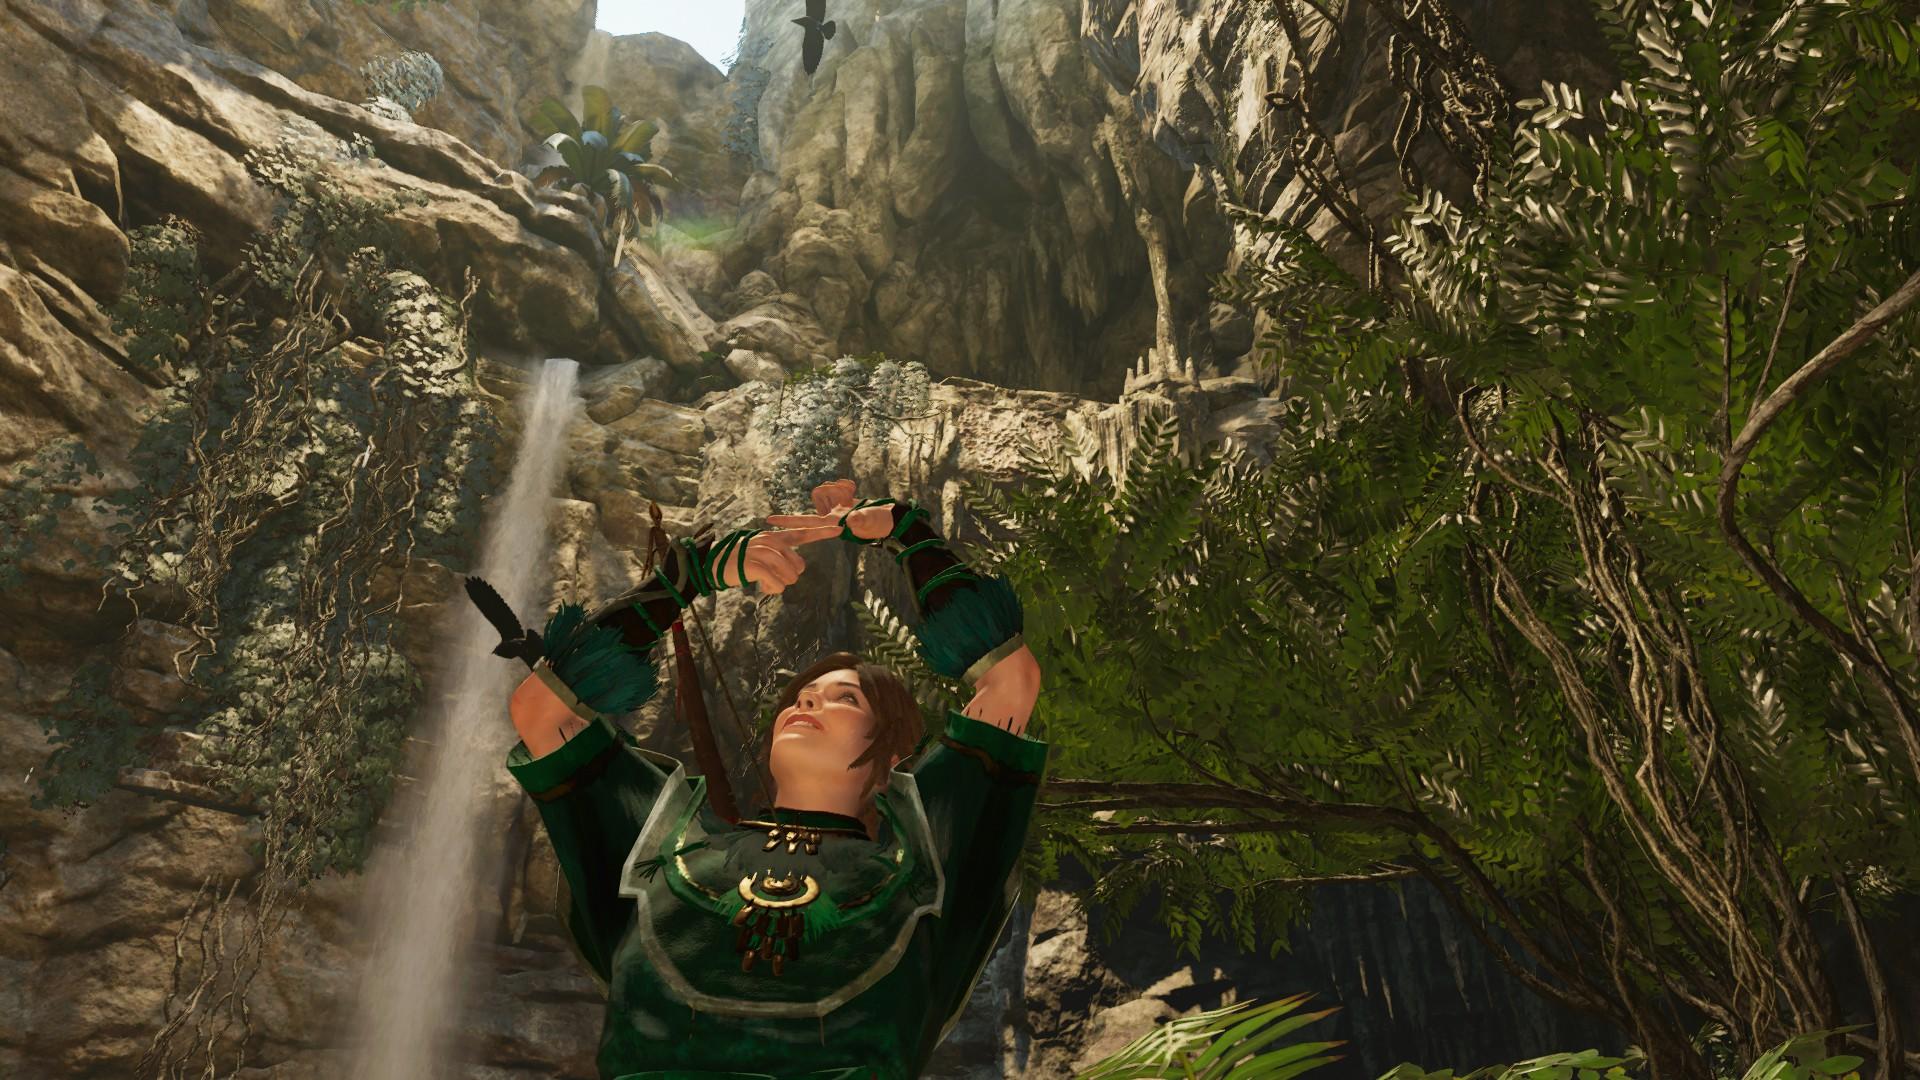 20190331155004_1.jpg - Shadow of the Tomb Raider